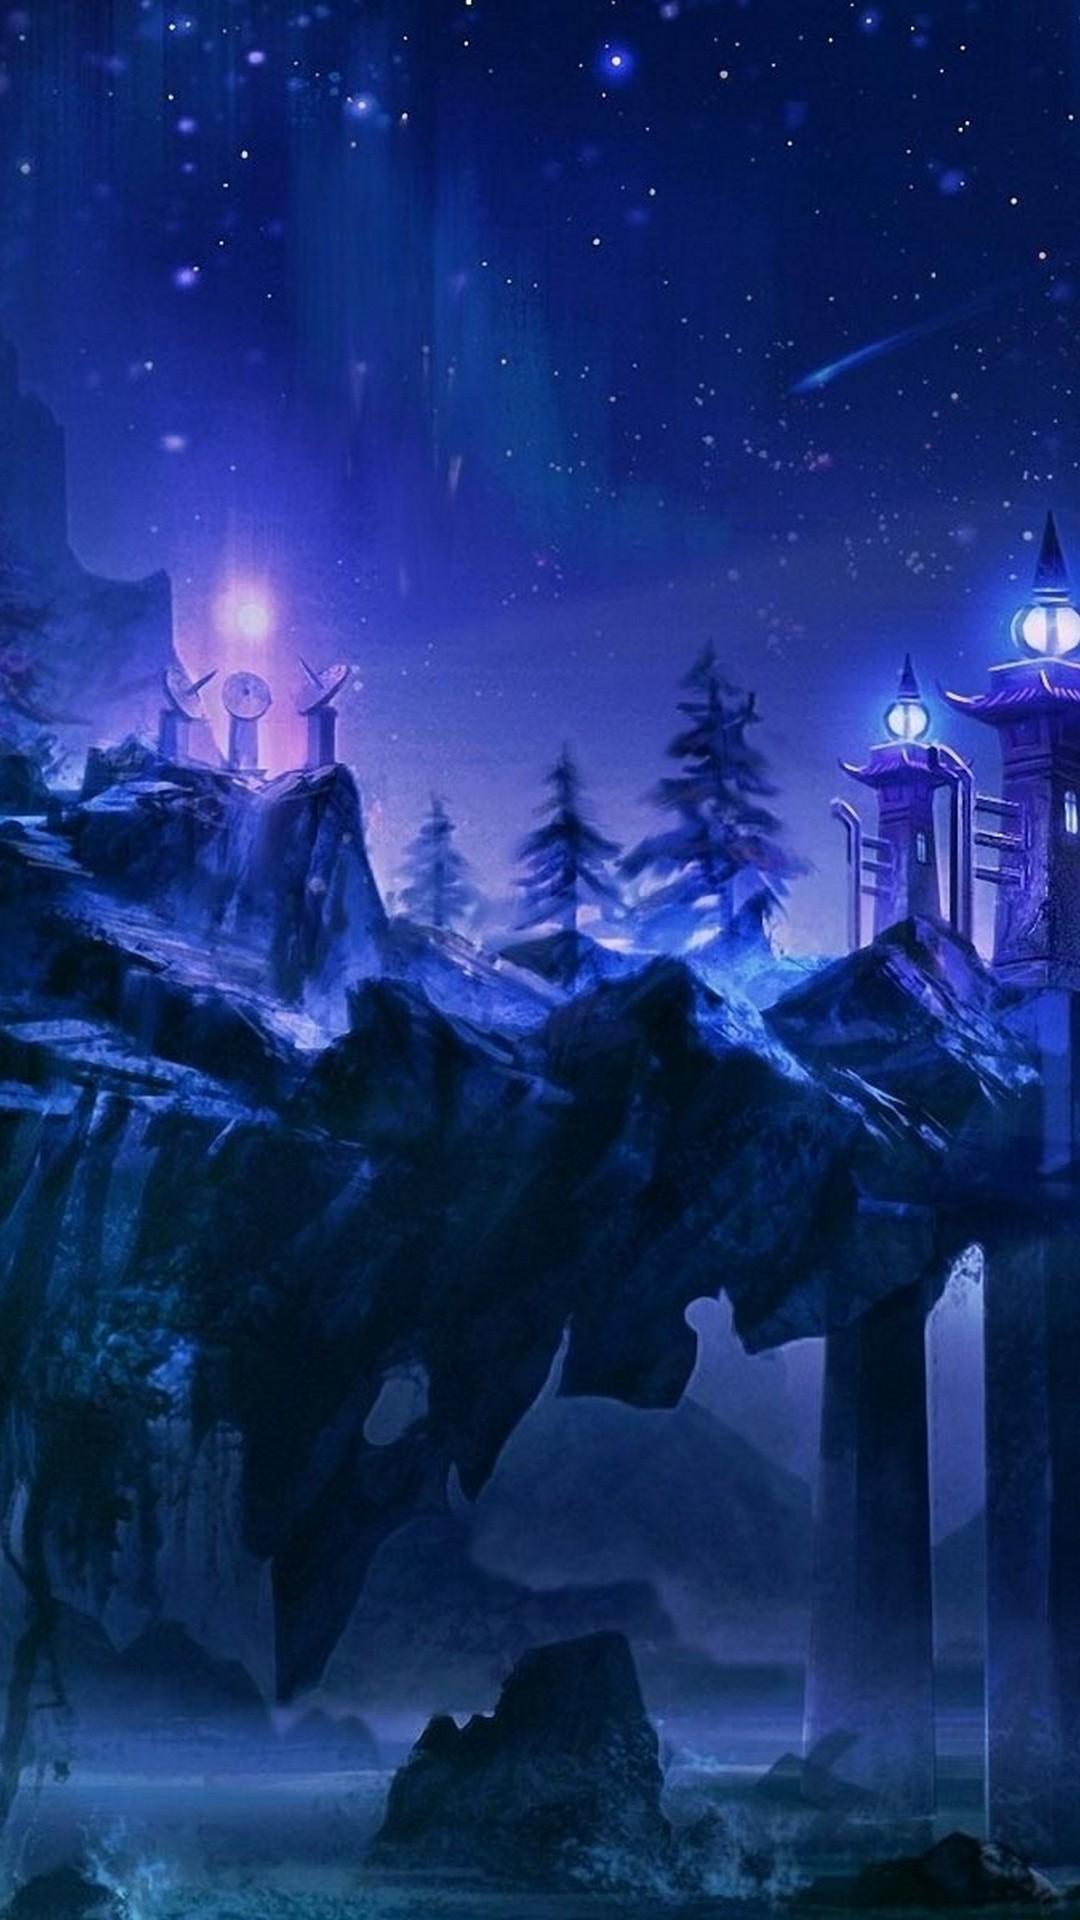 Fantasy Night View